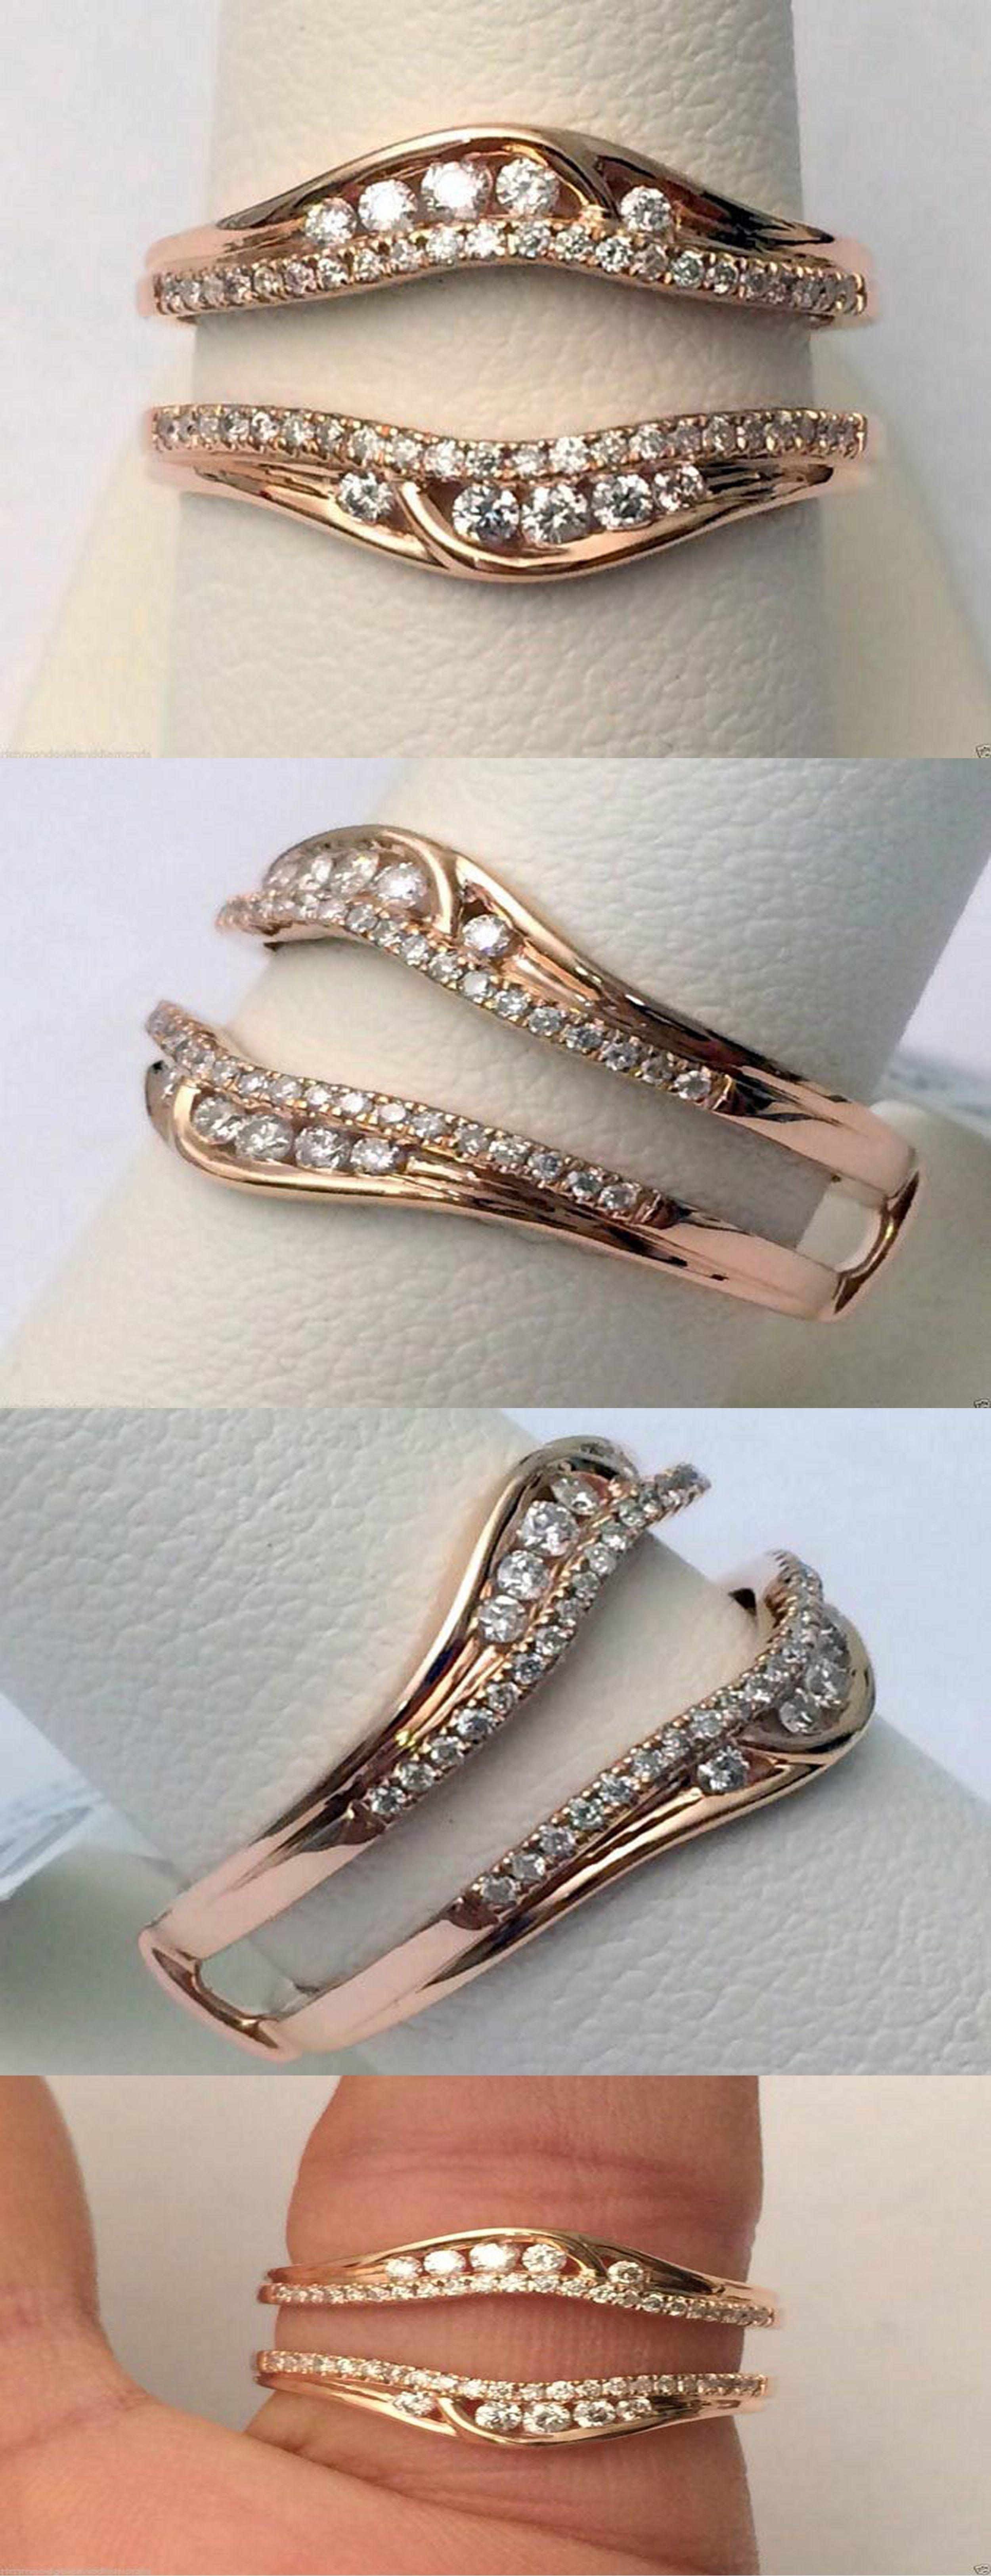 NEW Solitaire Enhancer Diamonds Ring Guard Wrap 14k White Gold